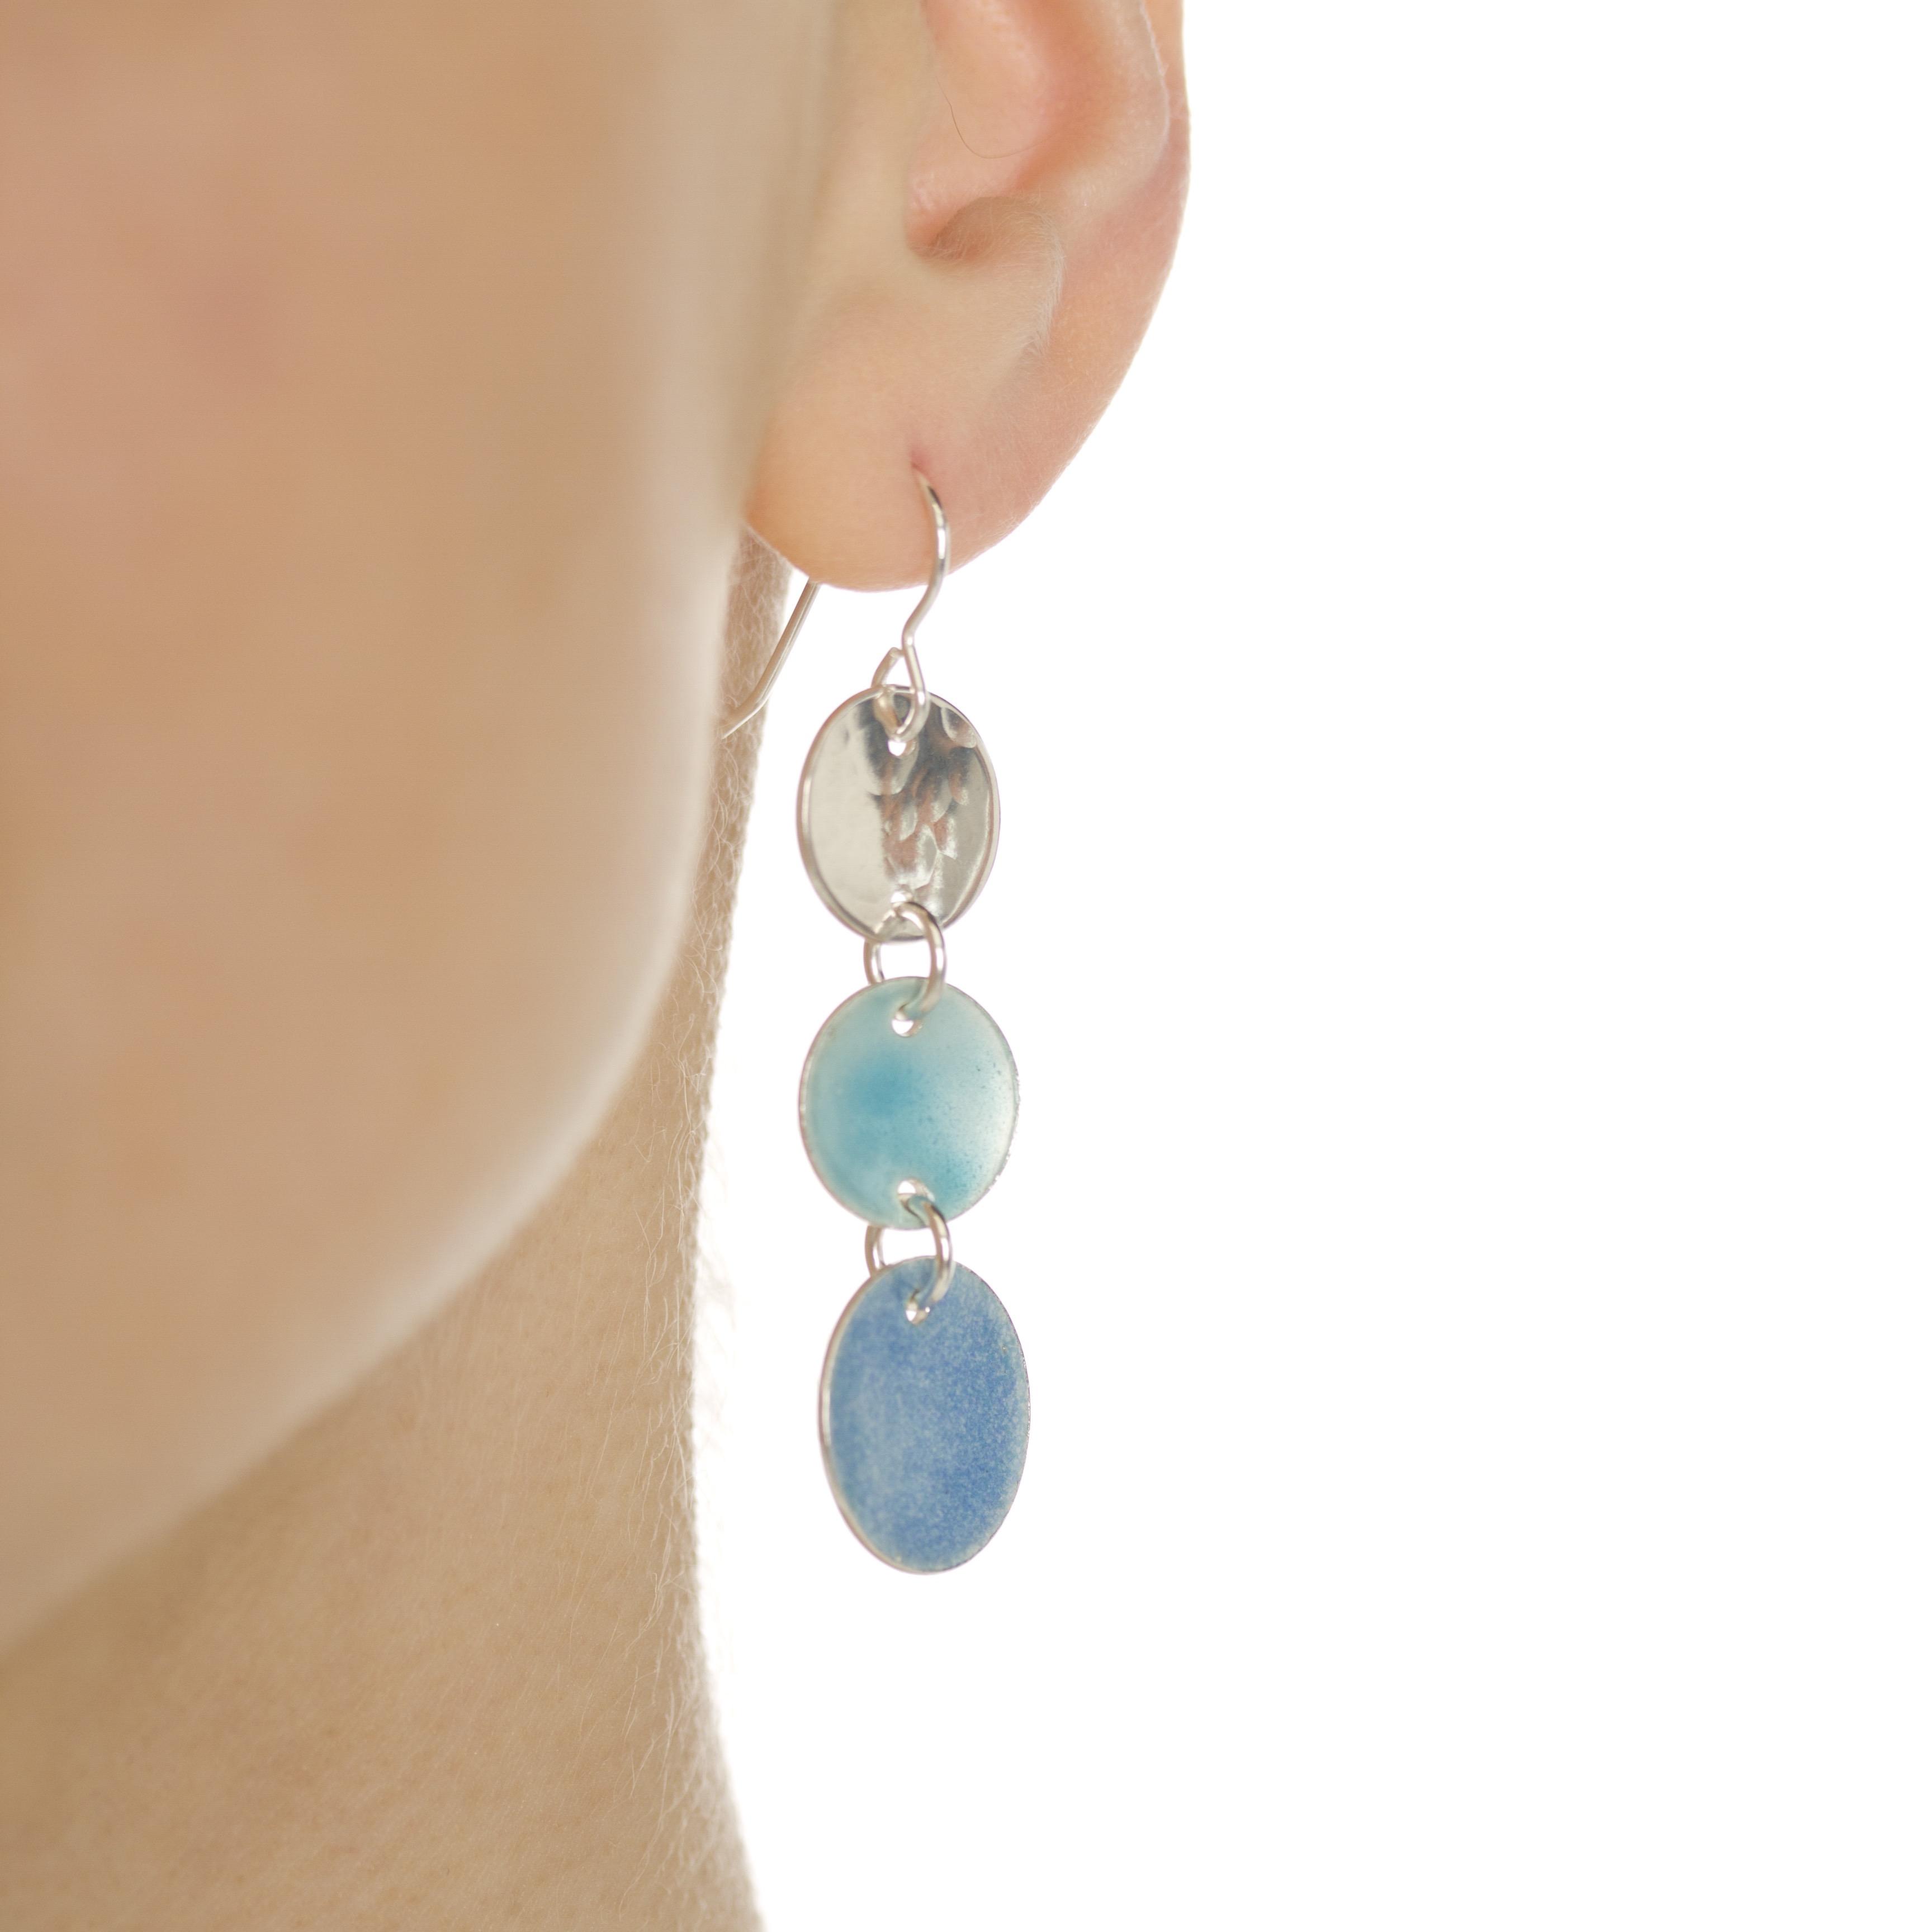 handmade langorran enamelled silver earrings carole